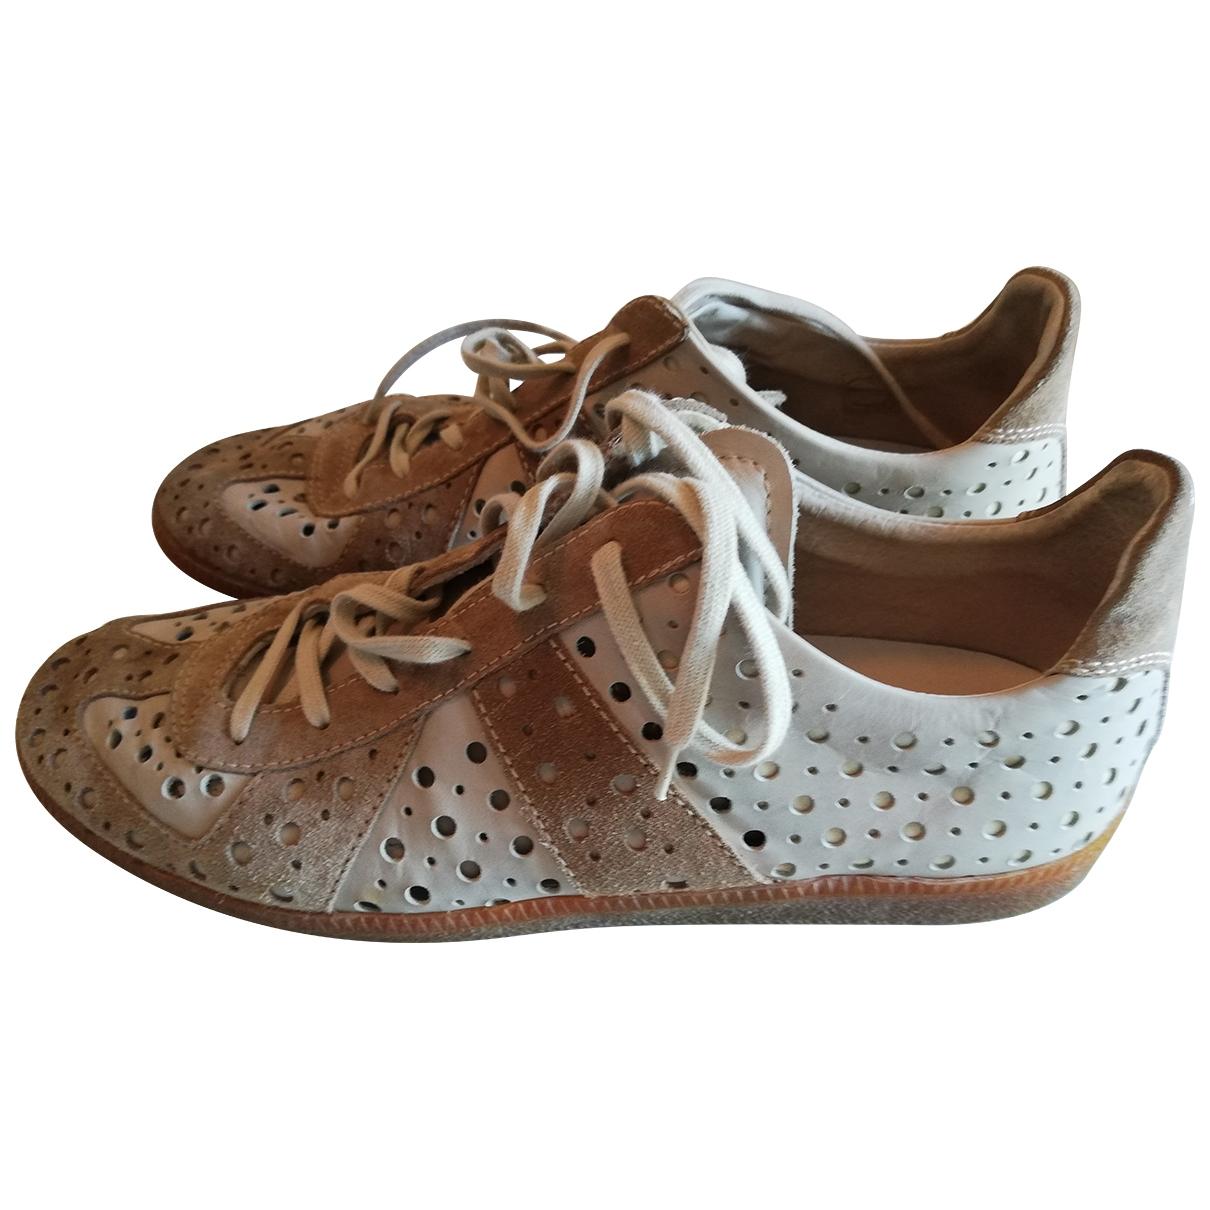 Maison Martin Margiela \N Sneakers in  Ecru Veloursleder